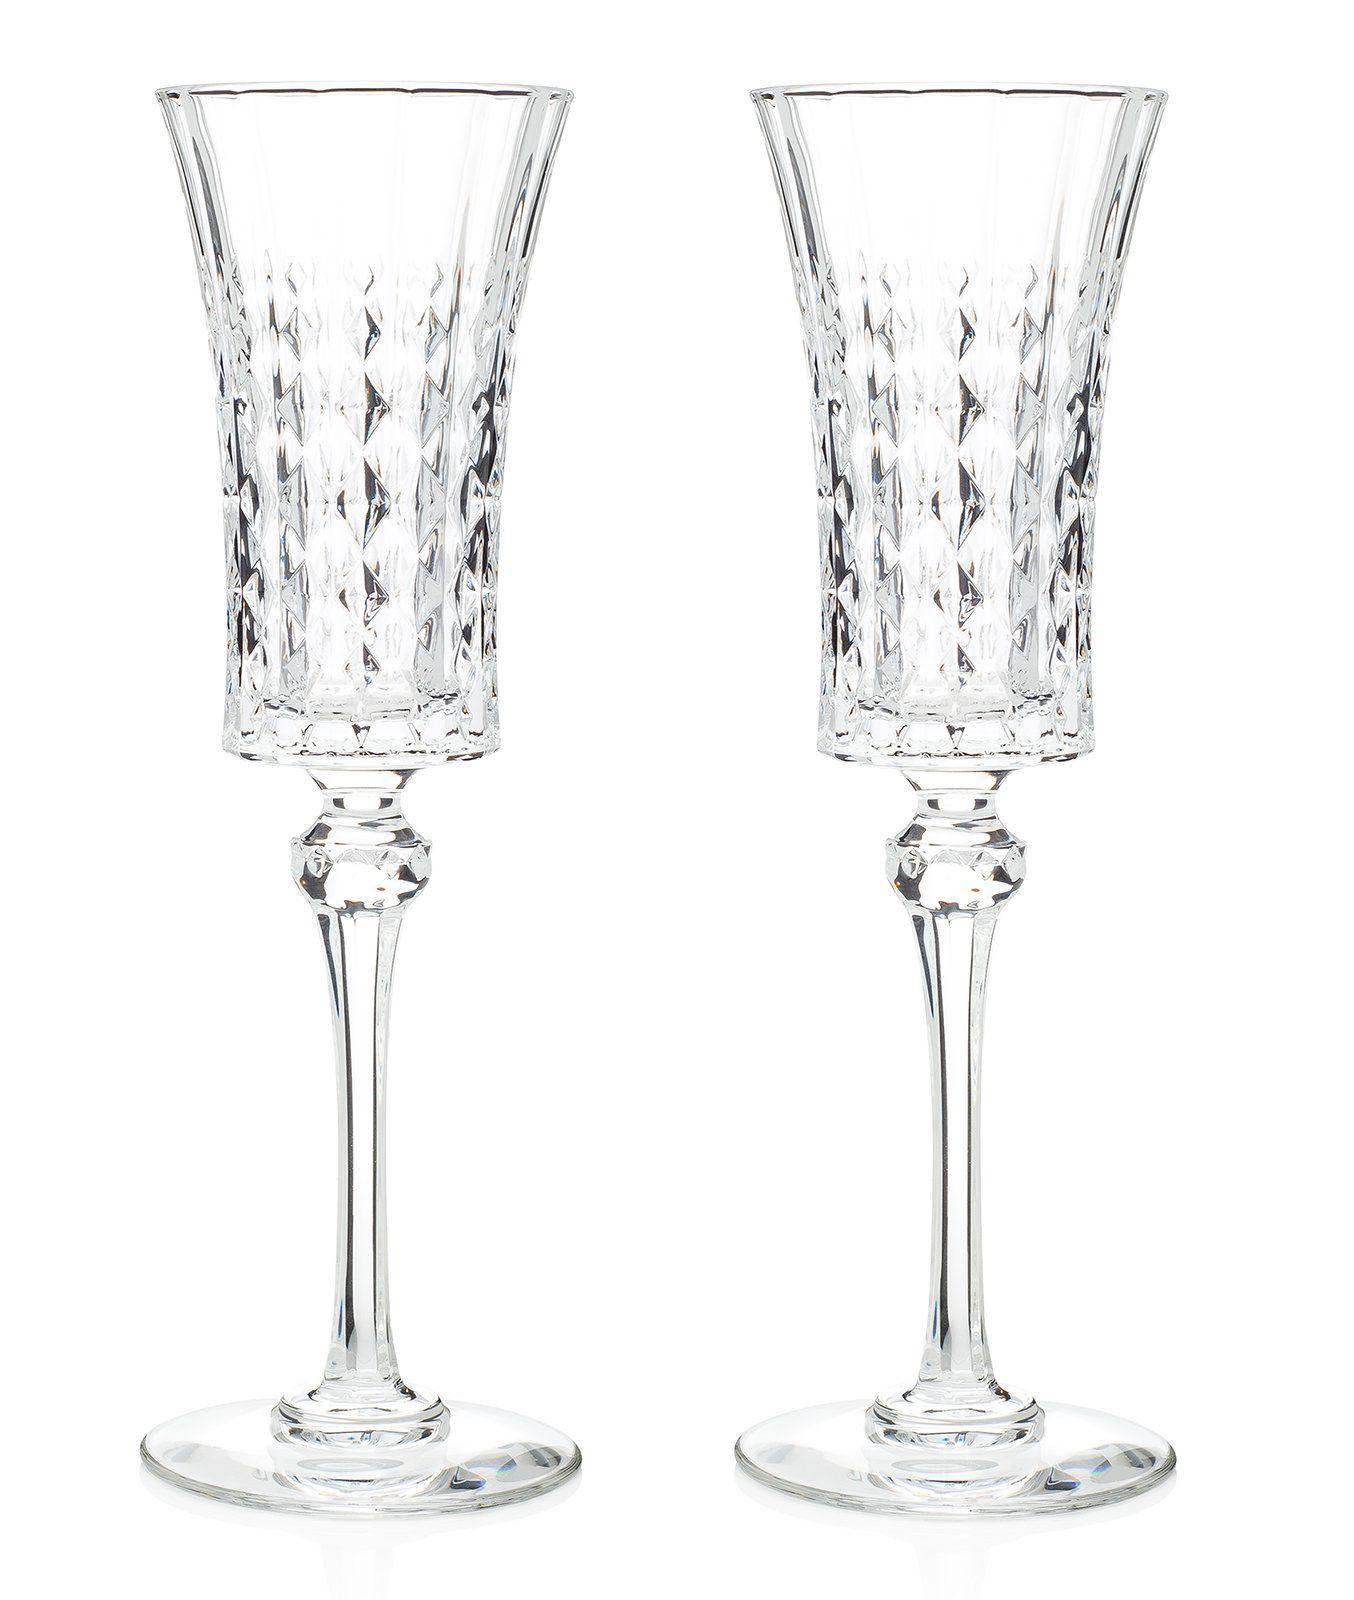 Park Art|My WordPress Blog_Veuve Clicquot Gift Set With Glasses